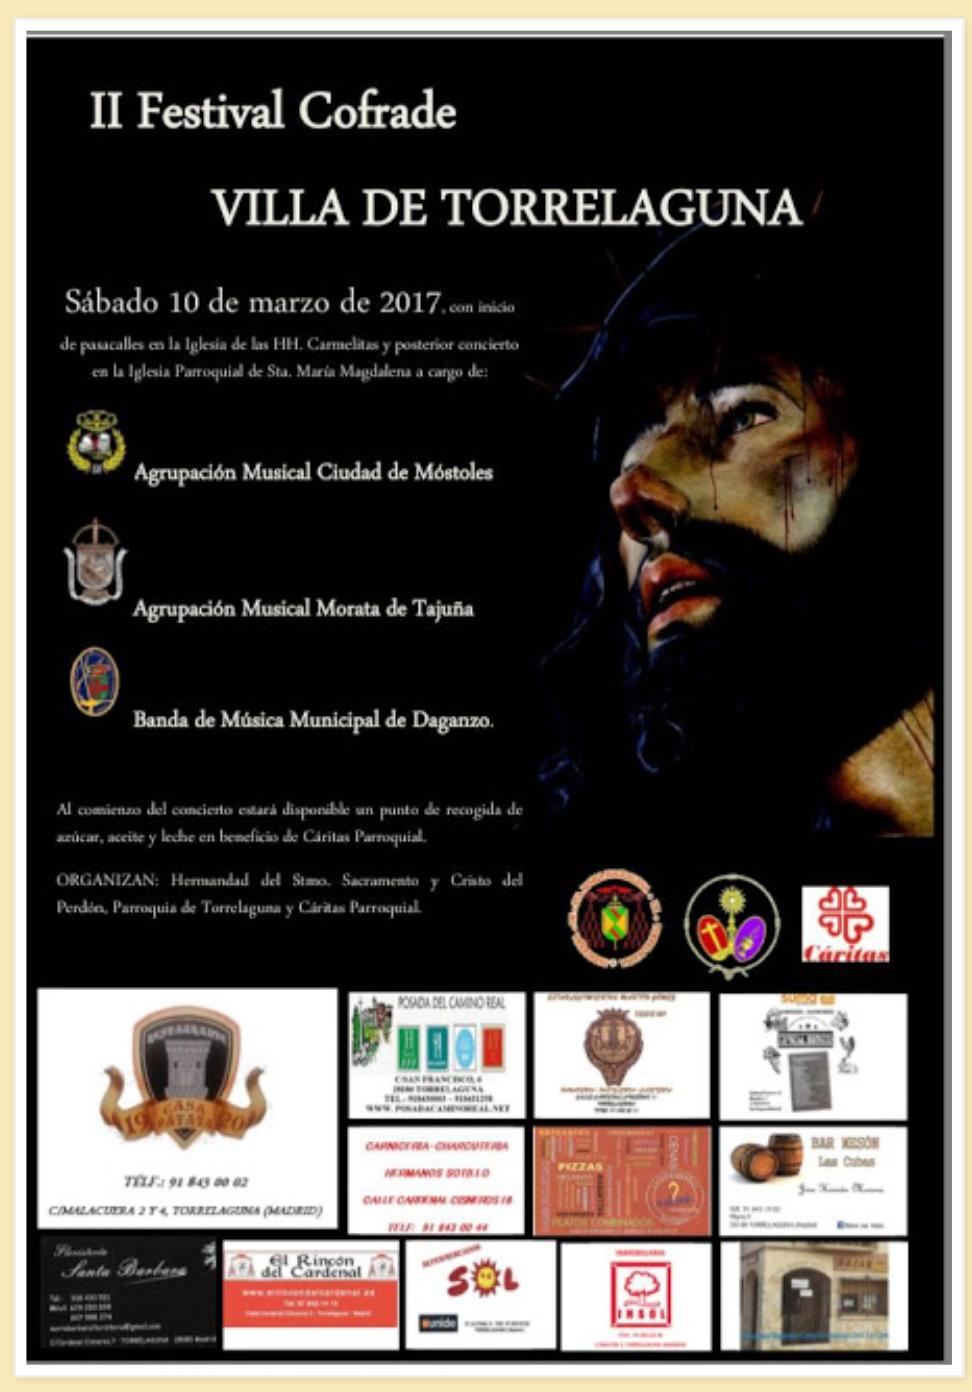 II FESTIVAL COFRADE VILLA DE TORRELAGUNA